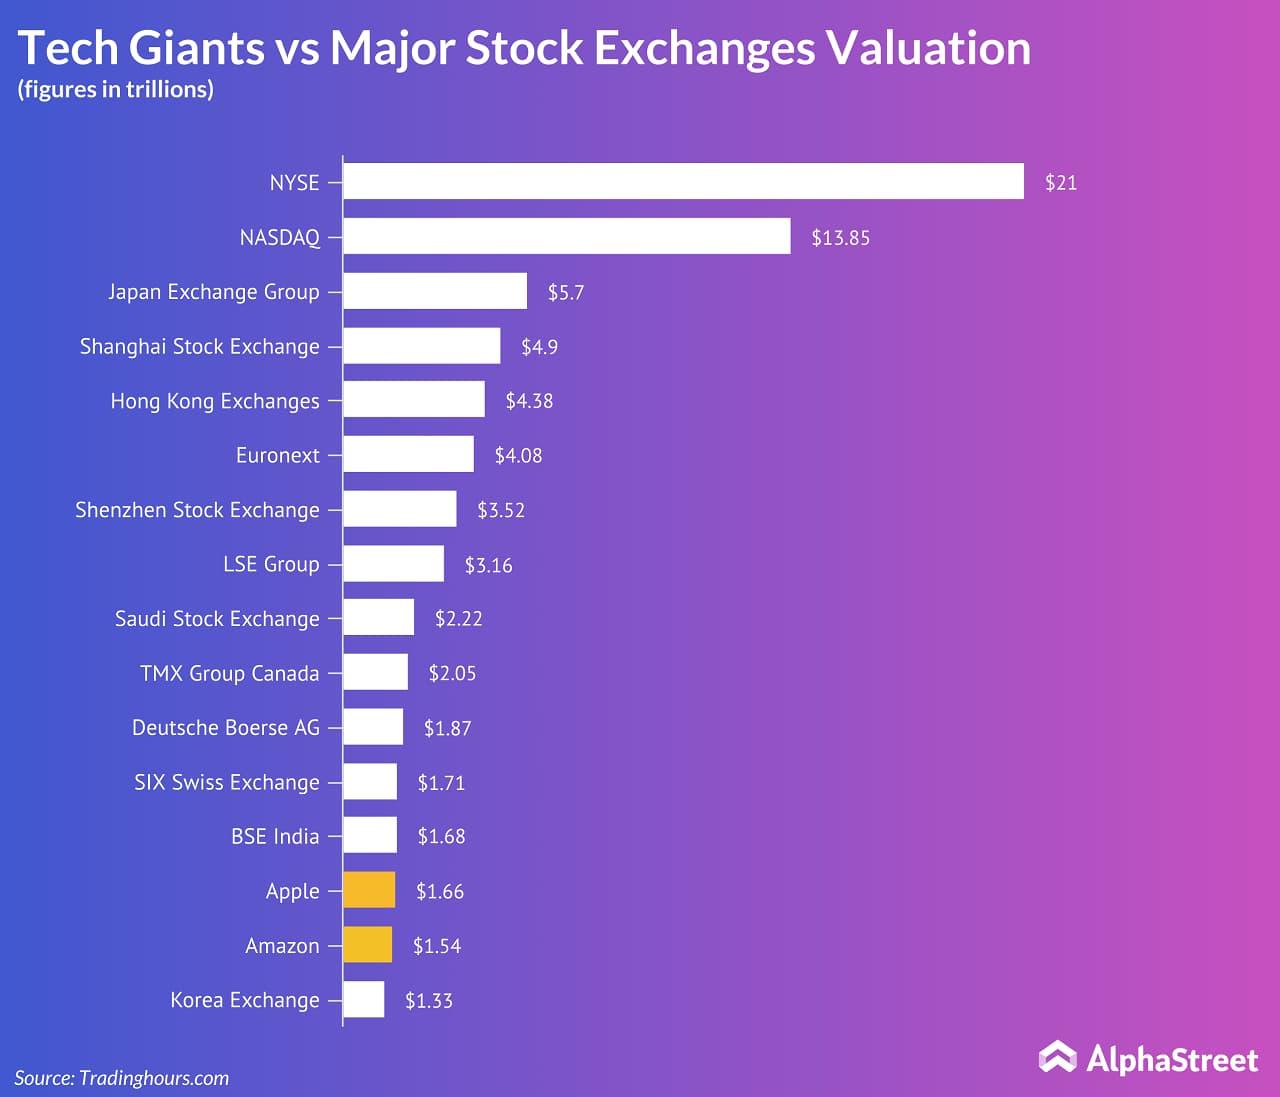 aaple, amazon vs major stock exchanges